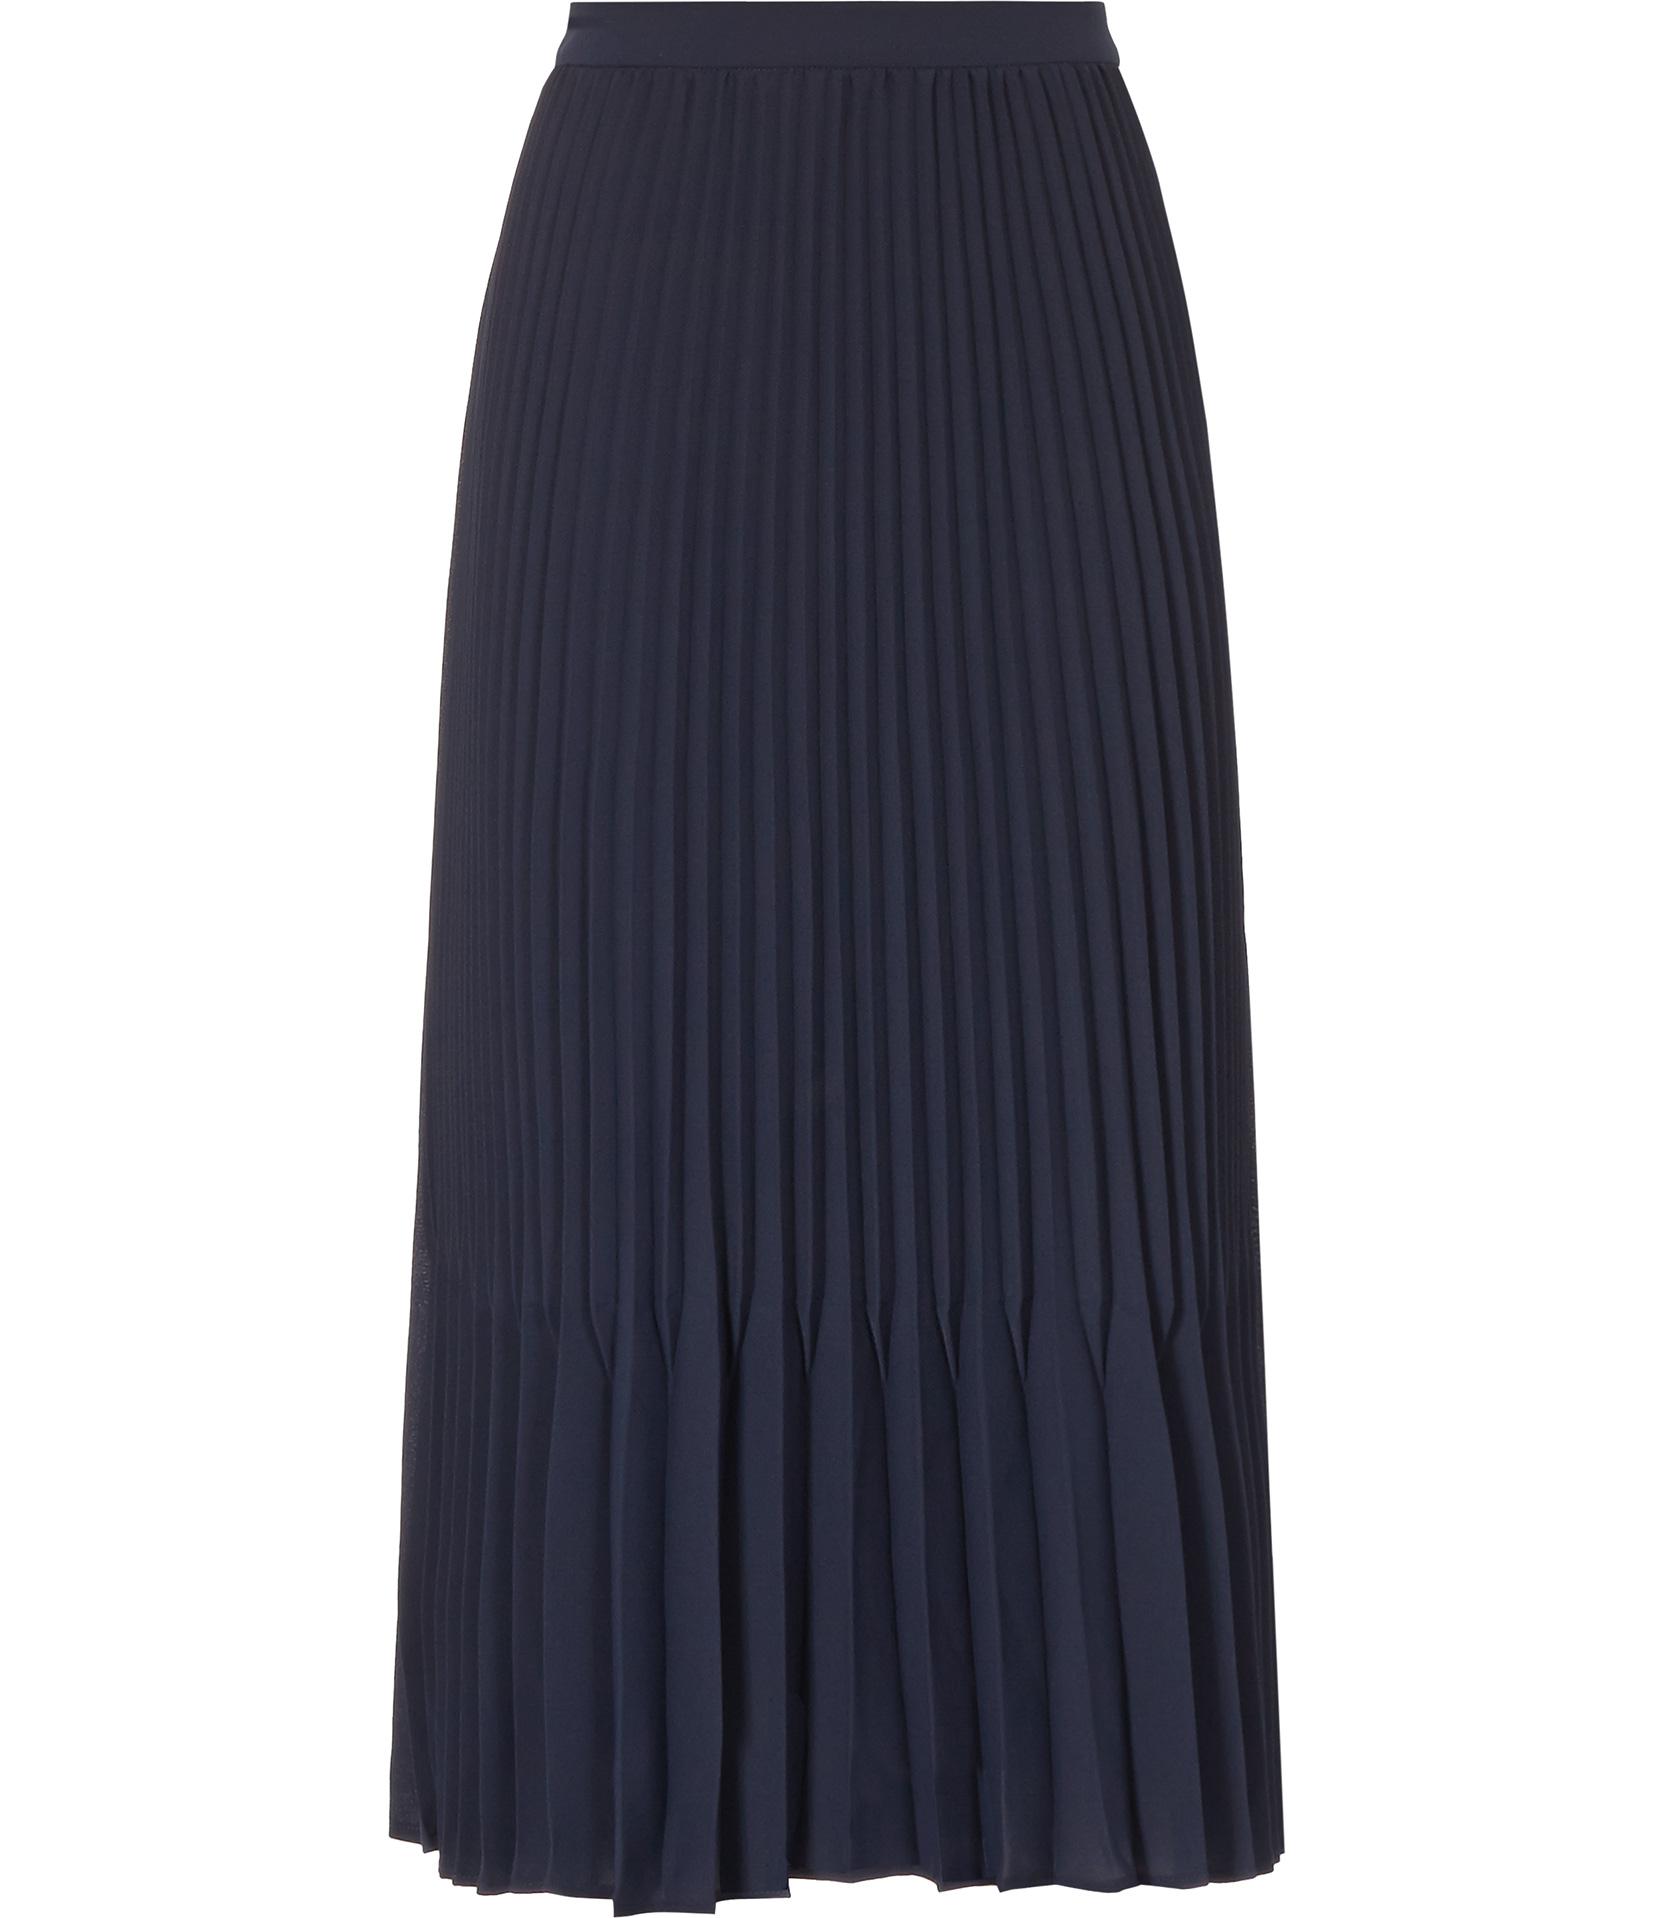 Reiss Baltimore Pleated Midi Skirt in Blue | Lyst